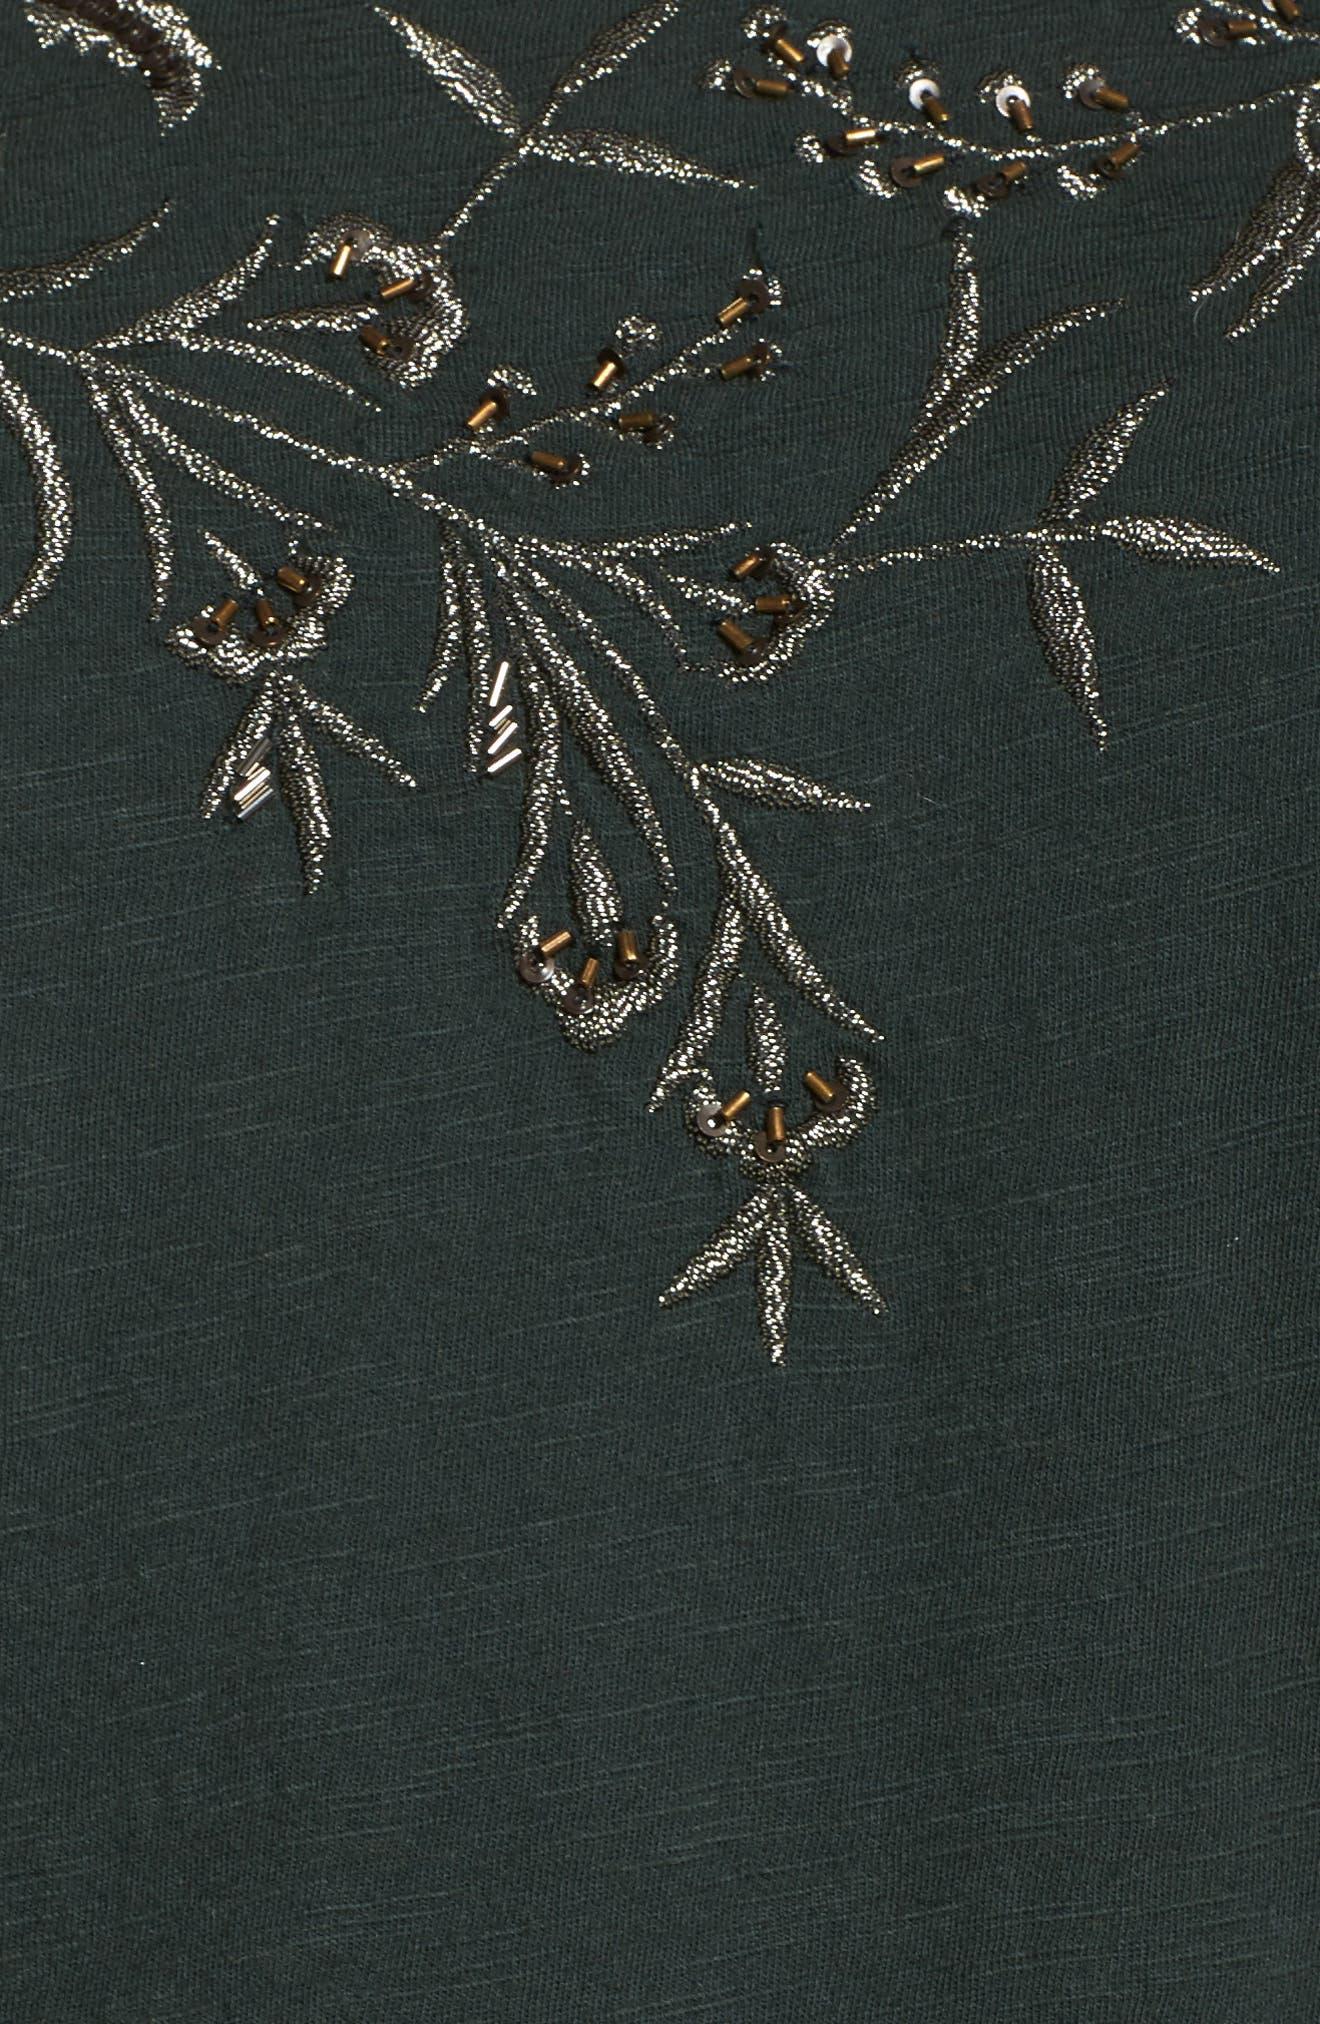 Floral Embellished Tee,                             Alternate thumbnail 5, color,                             Scarab